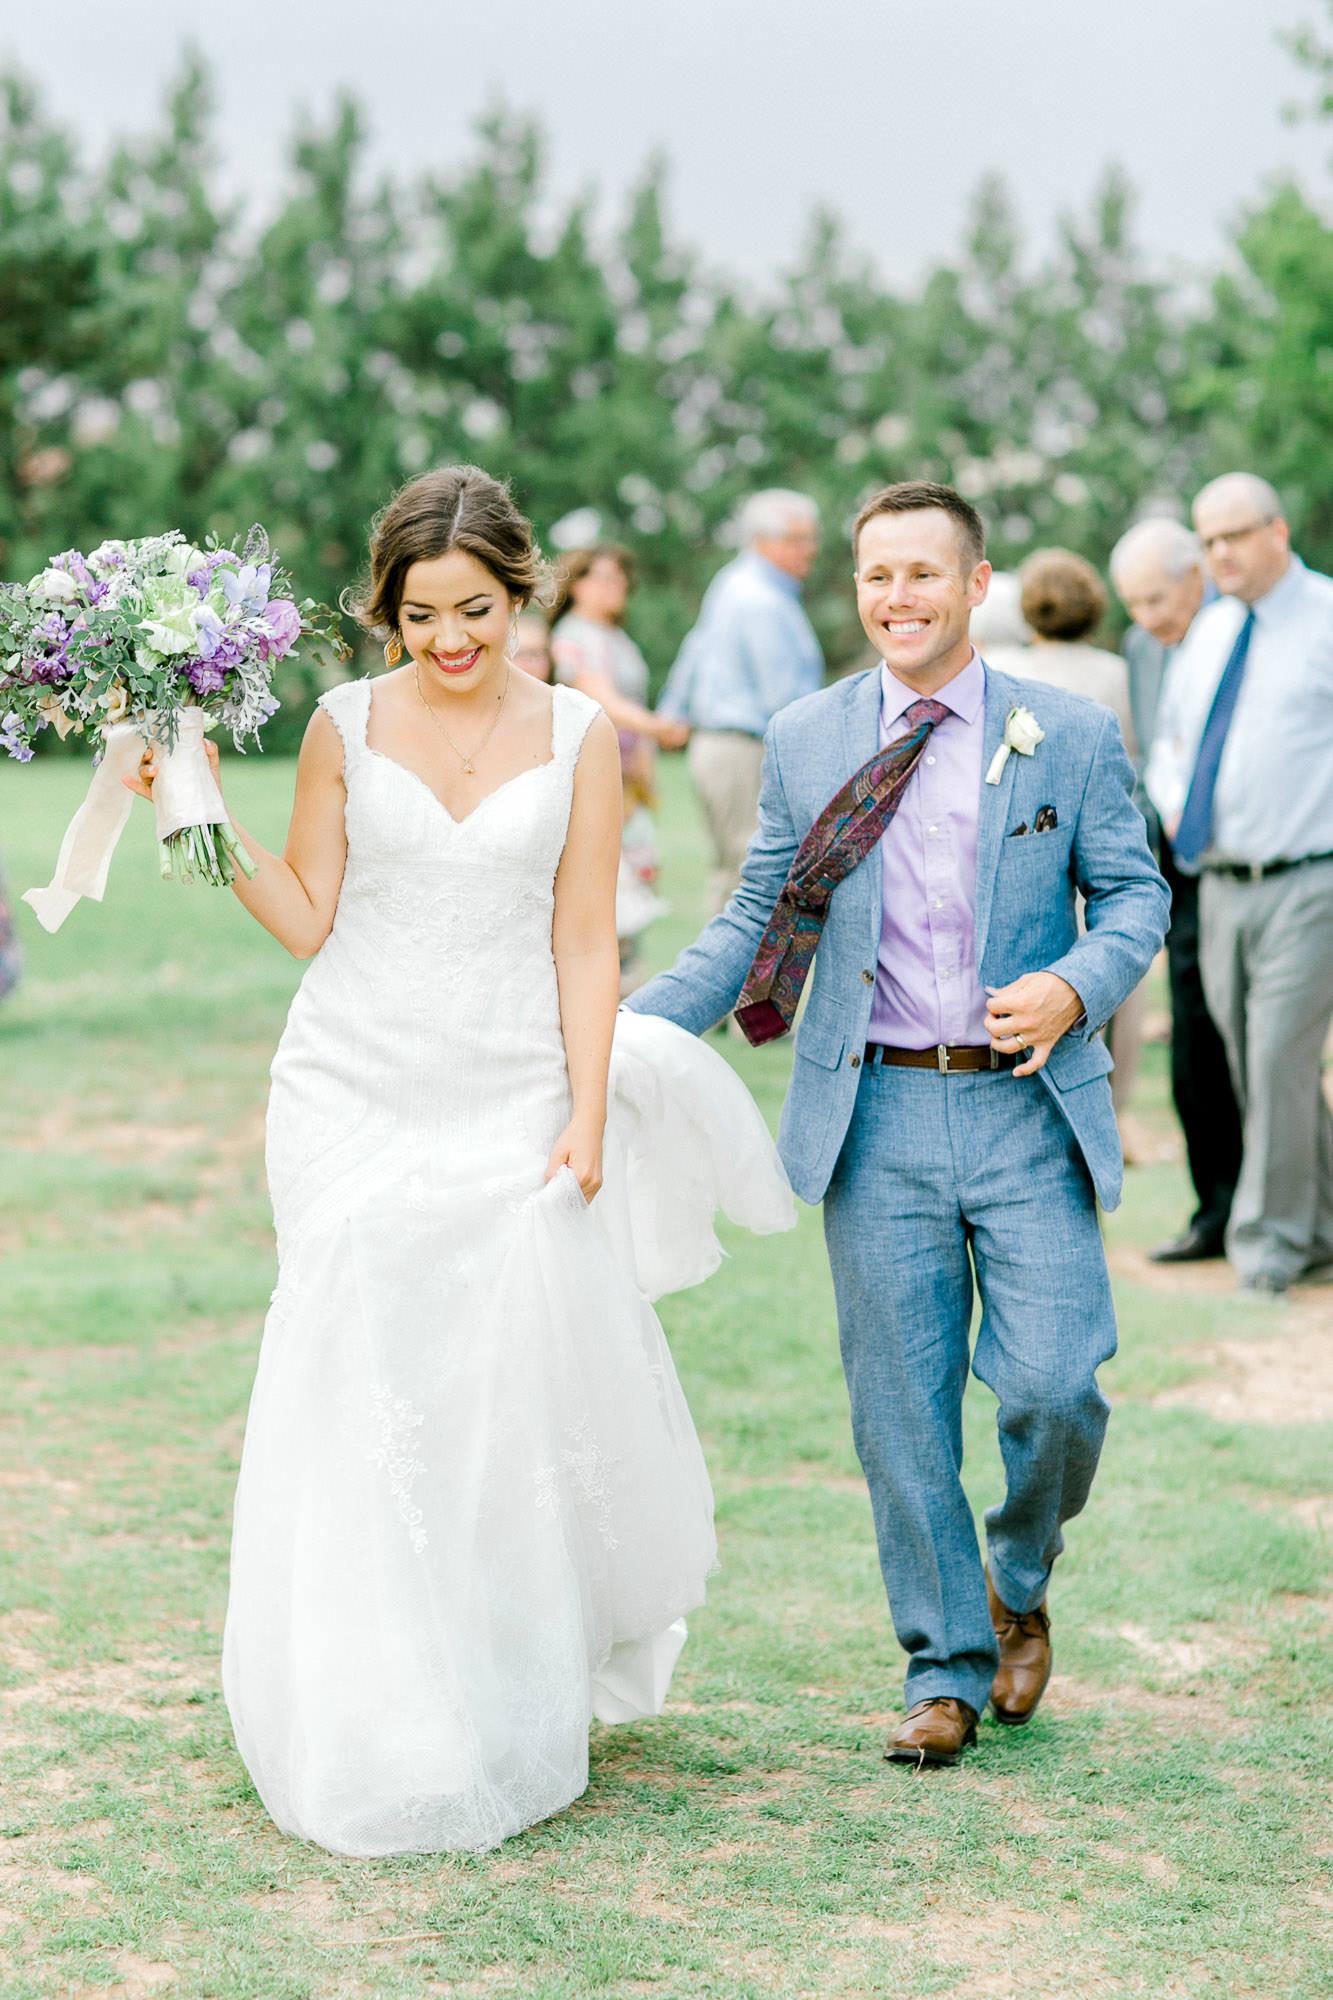 alexis-joel-laury-lubbock-weddingphotographer-alleej0022.jpg